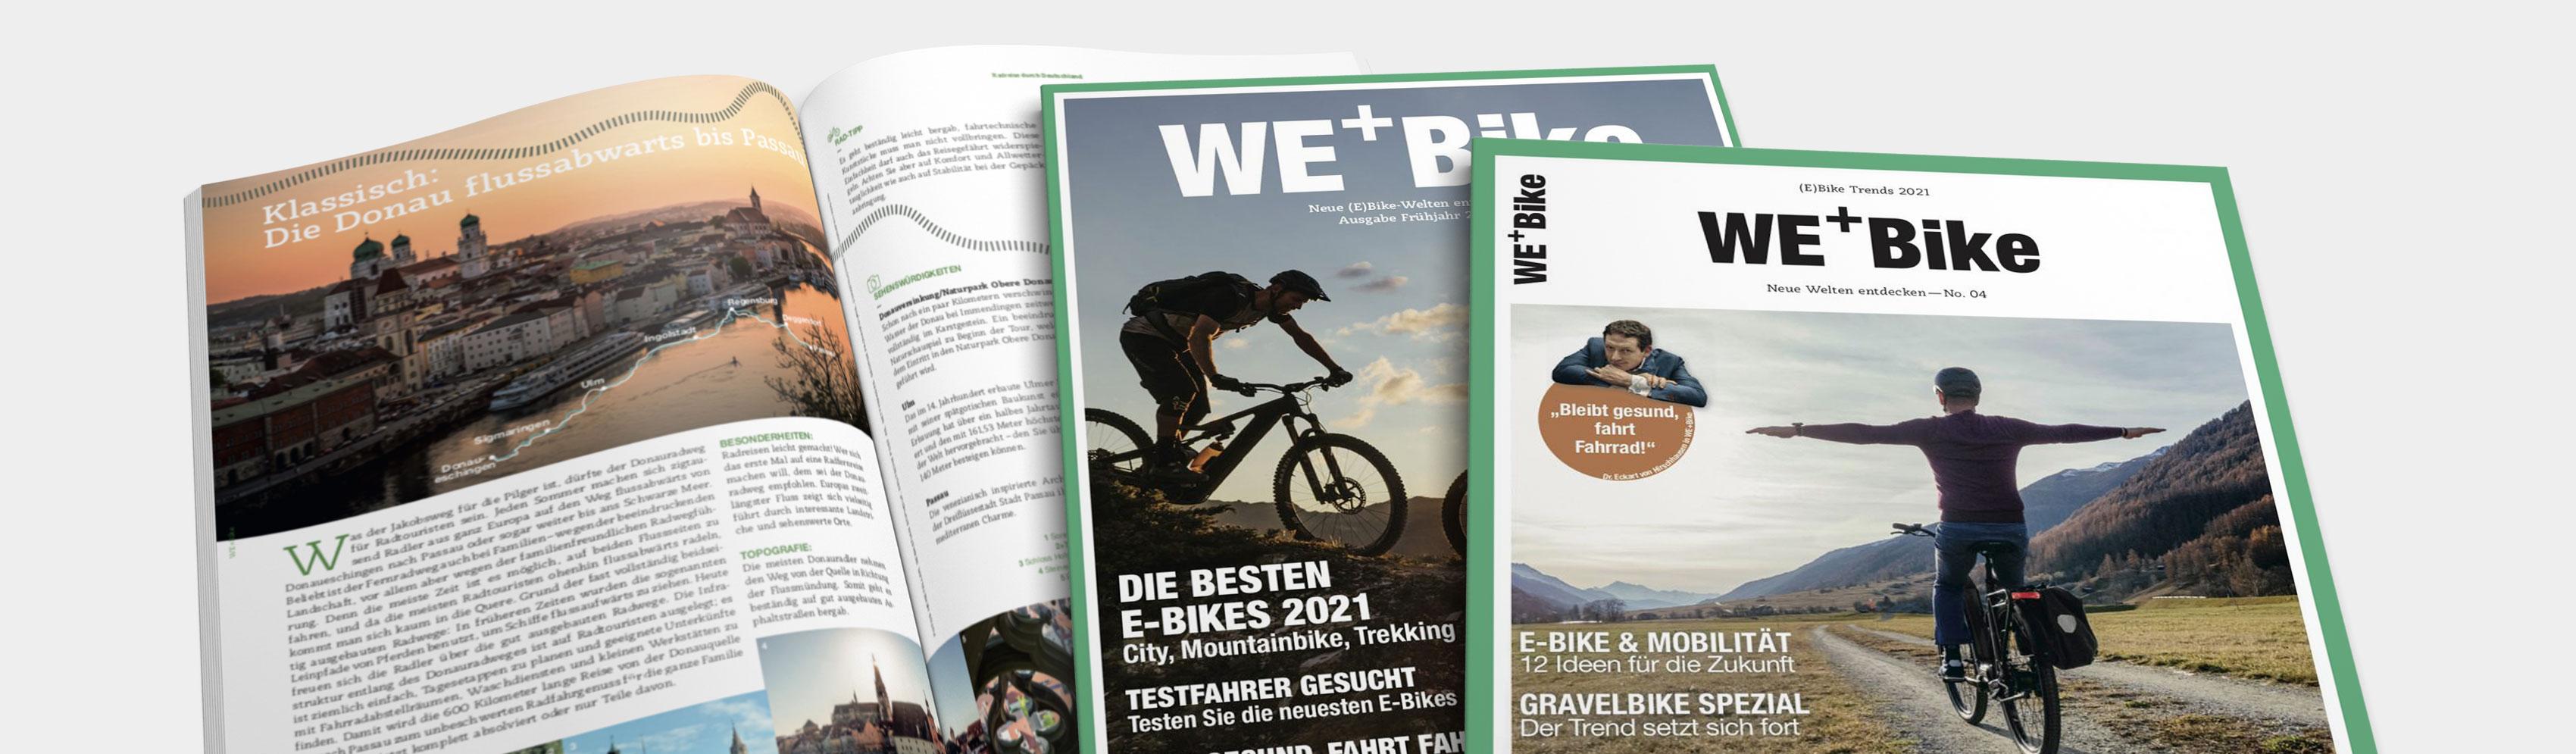 We+Bike